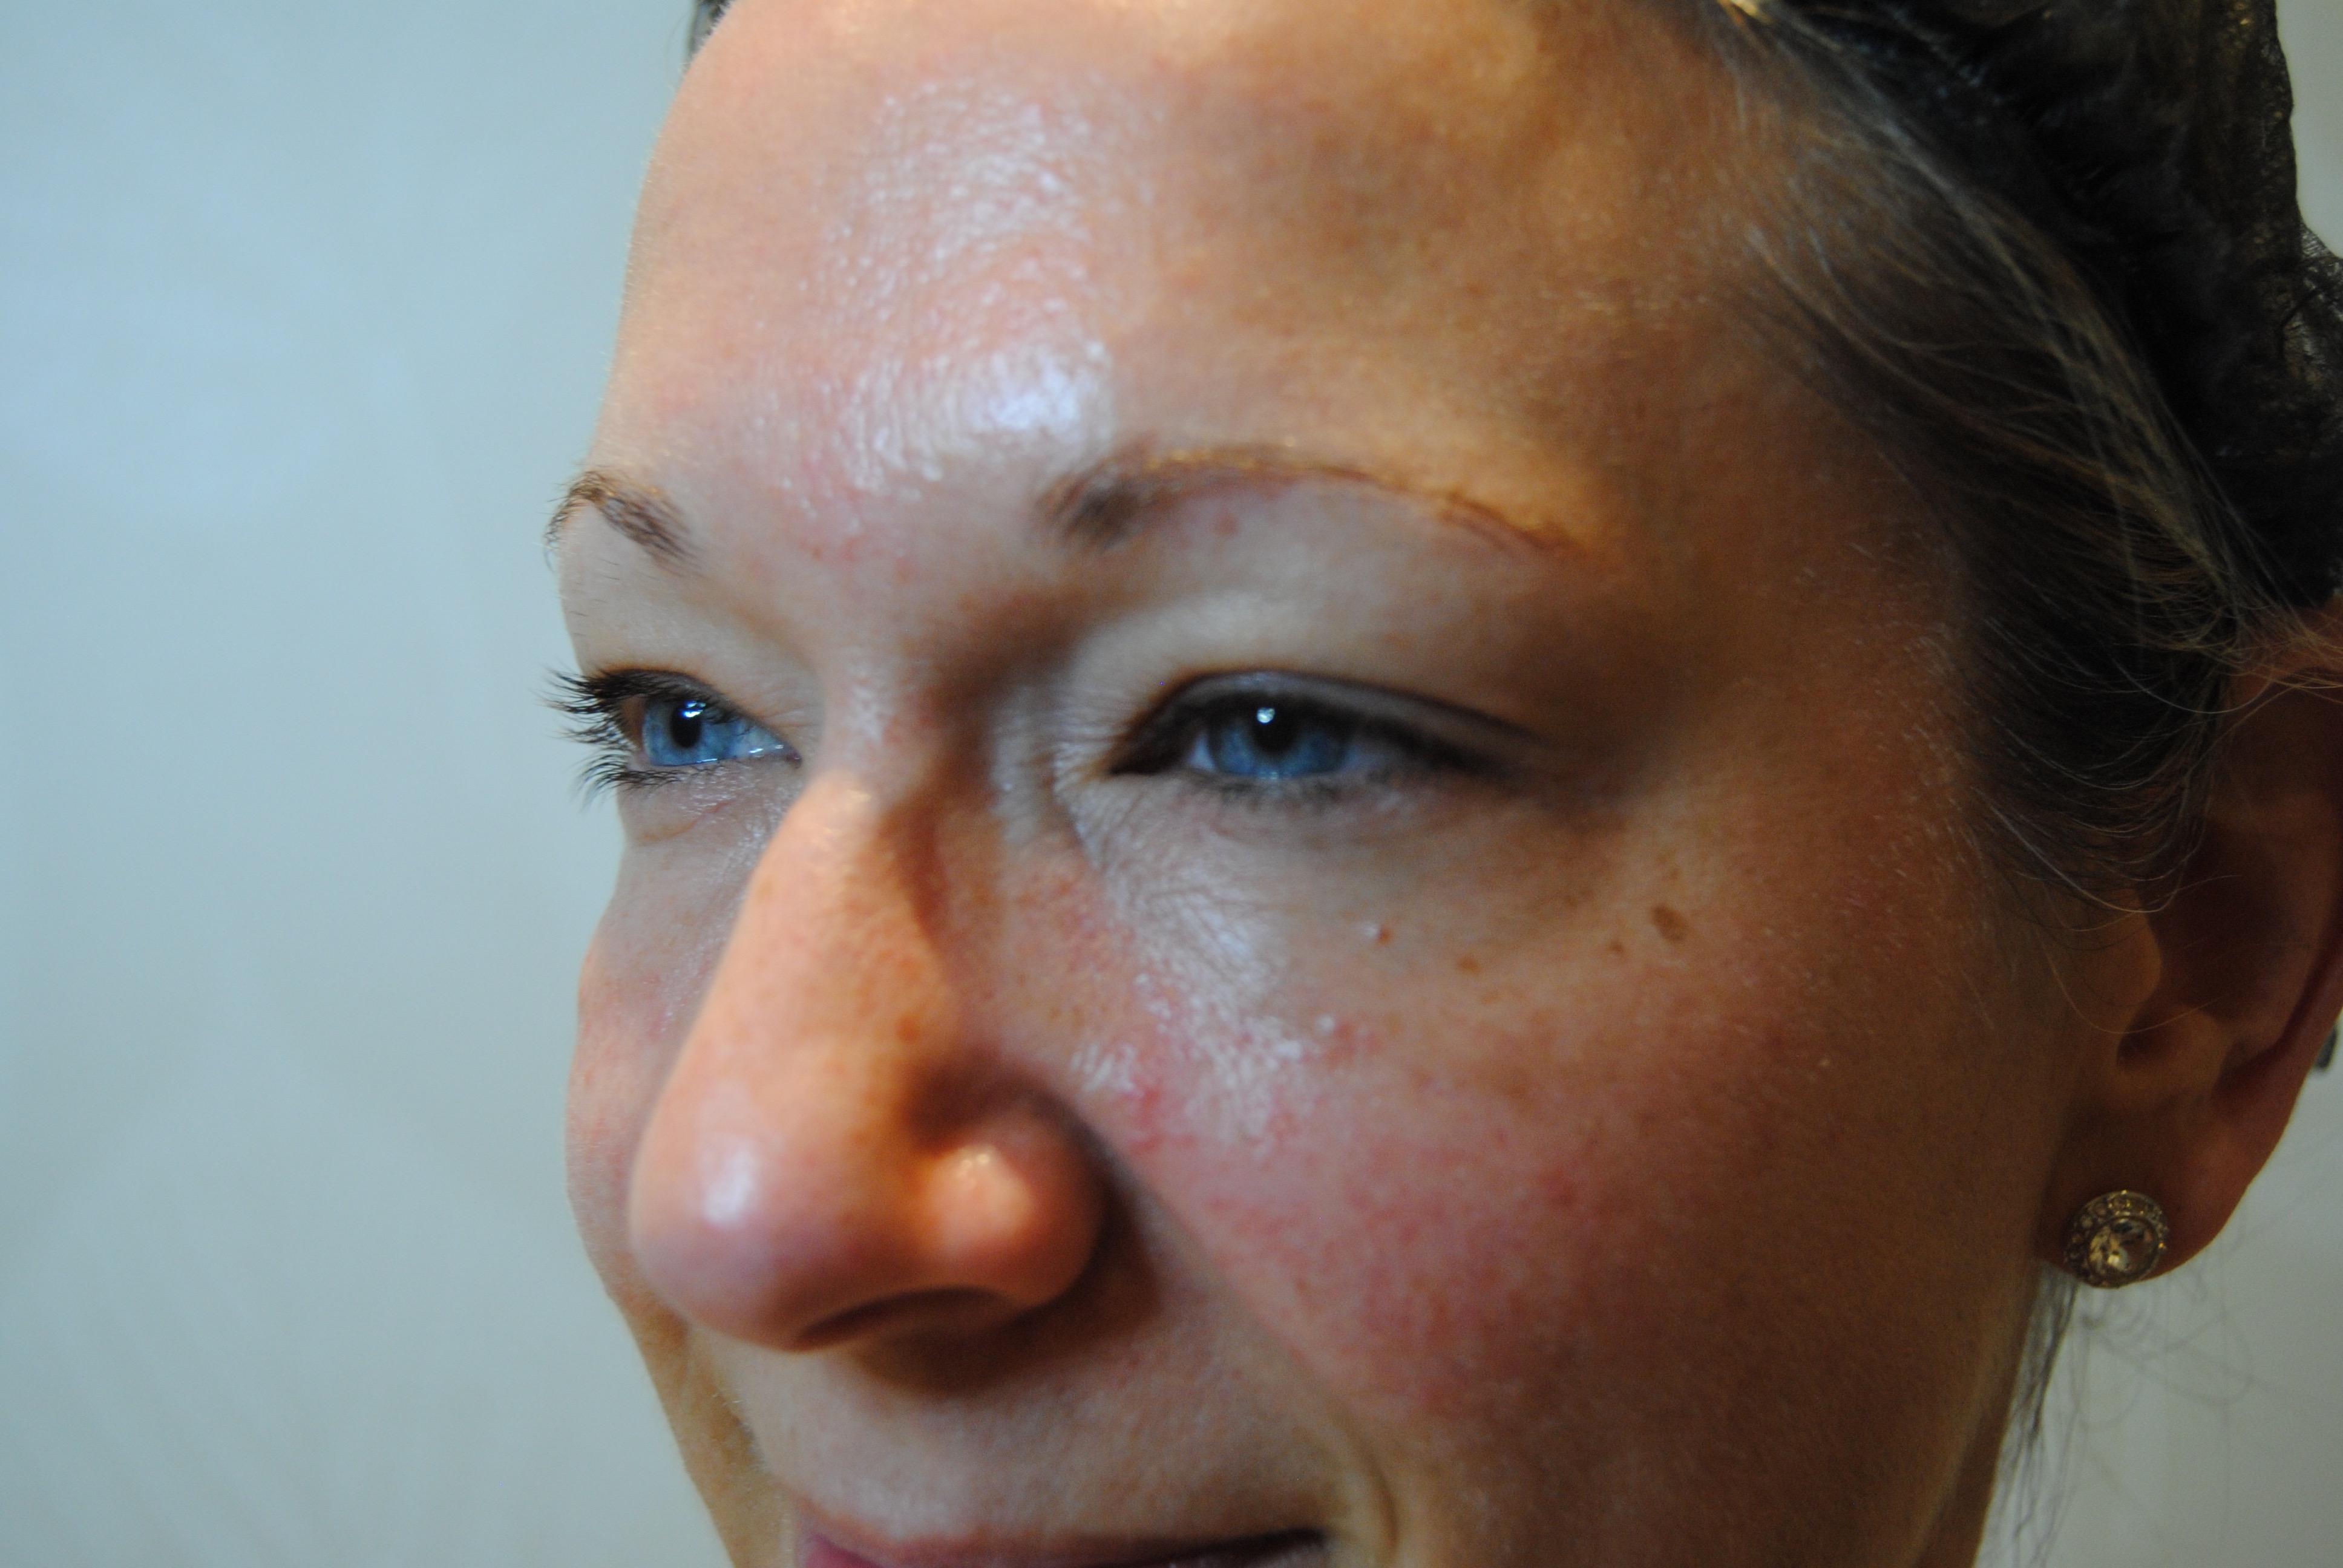 eyebrows_before